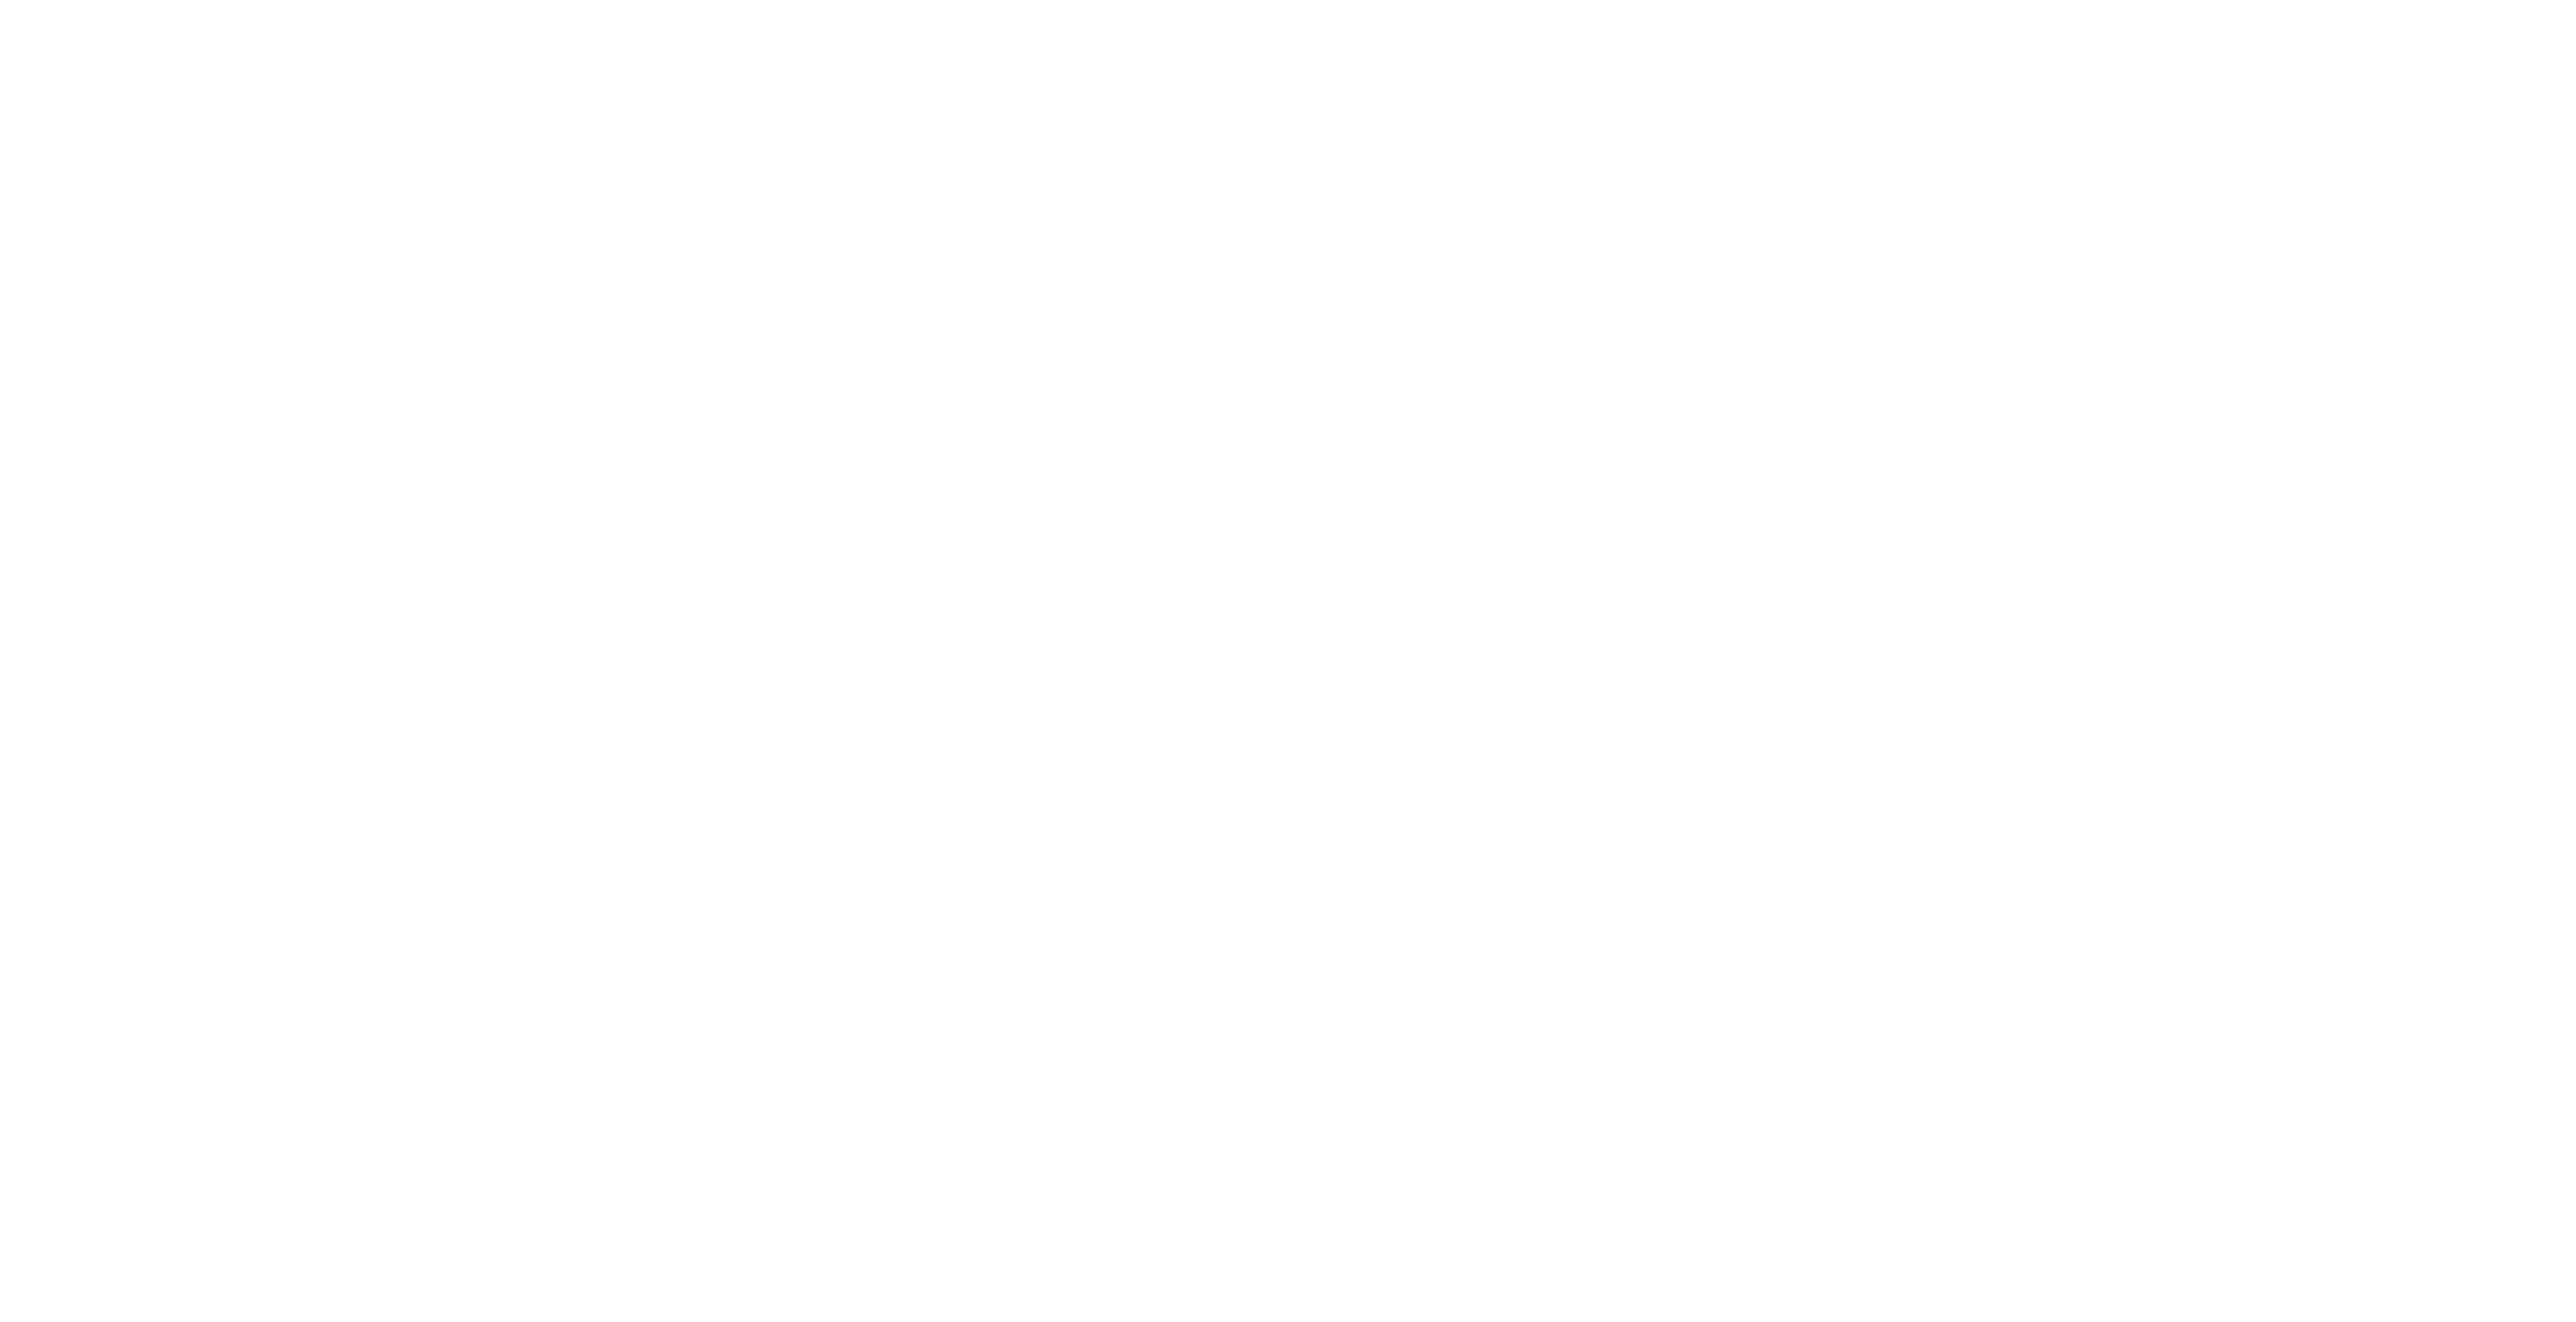 TECNVtransparant01